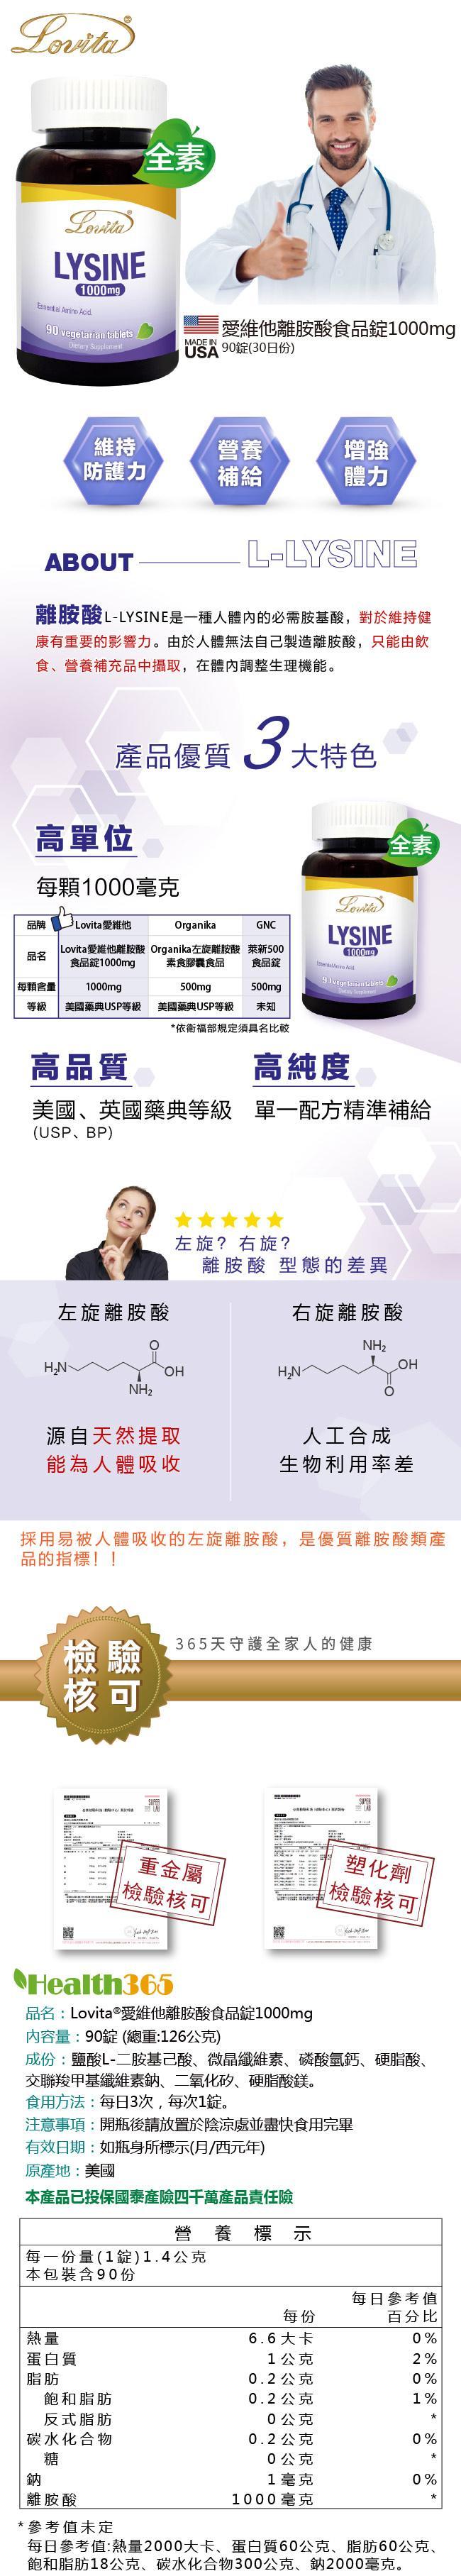 Lovita愛維他-離胺酸食品錠1000mg(90錠-30天份)產品資訊